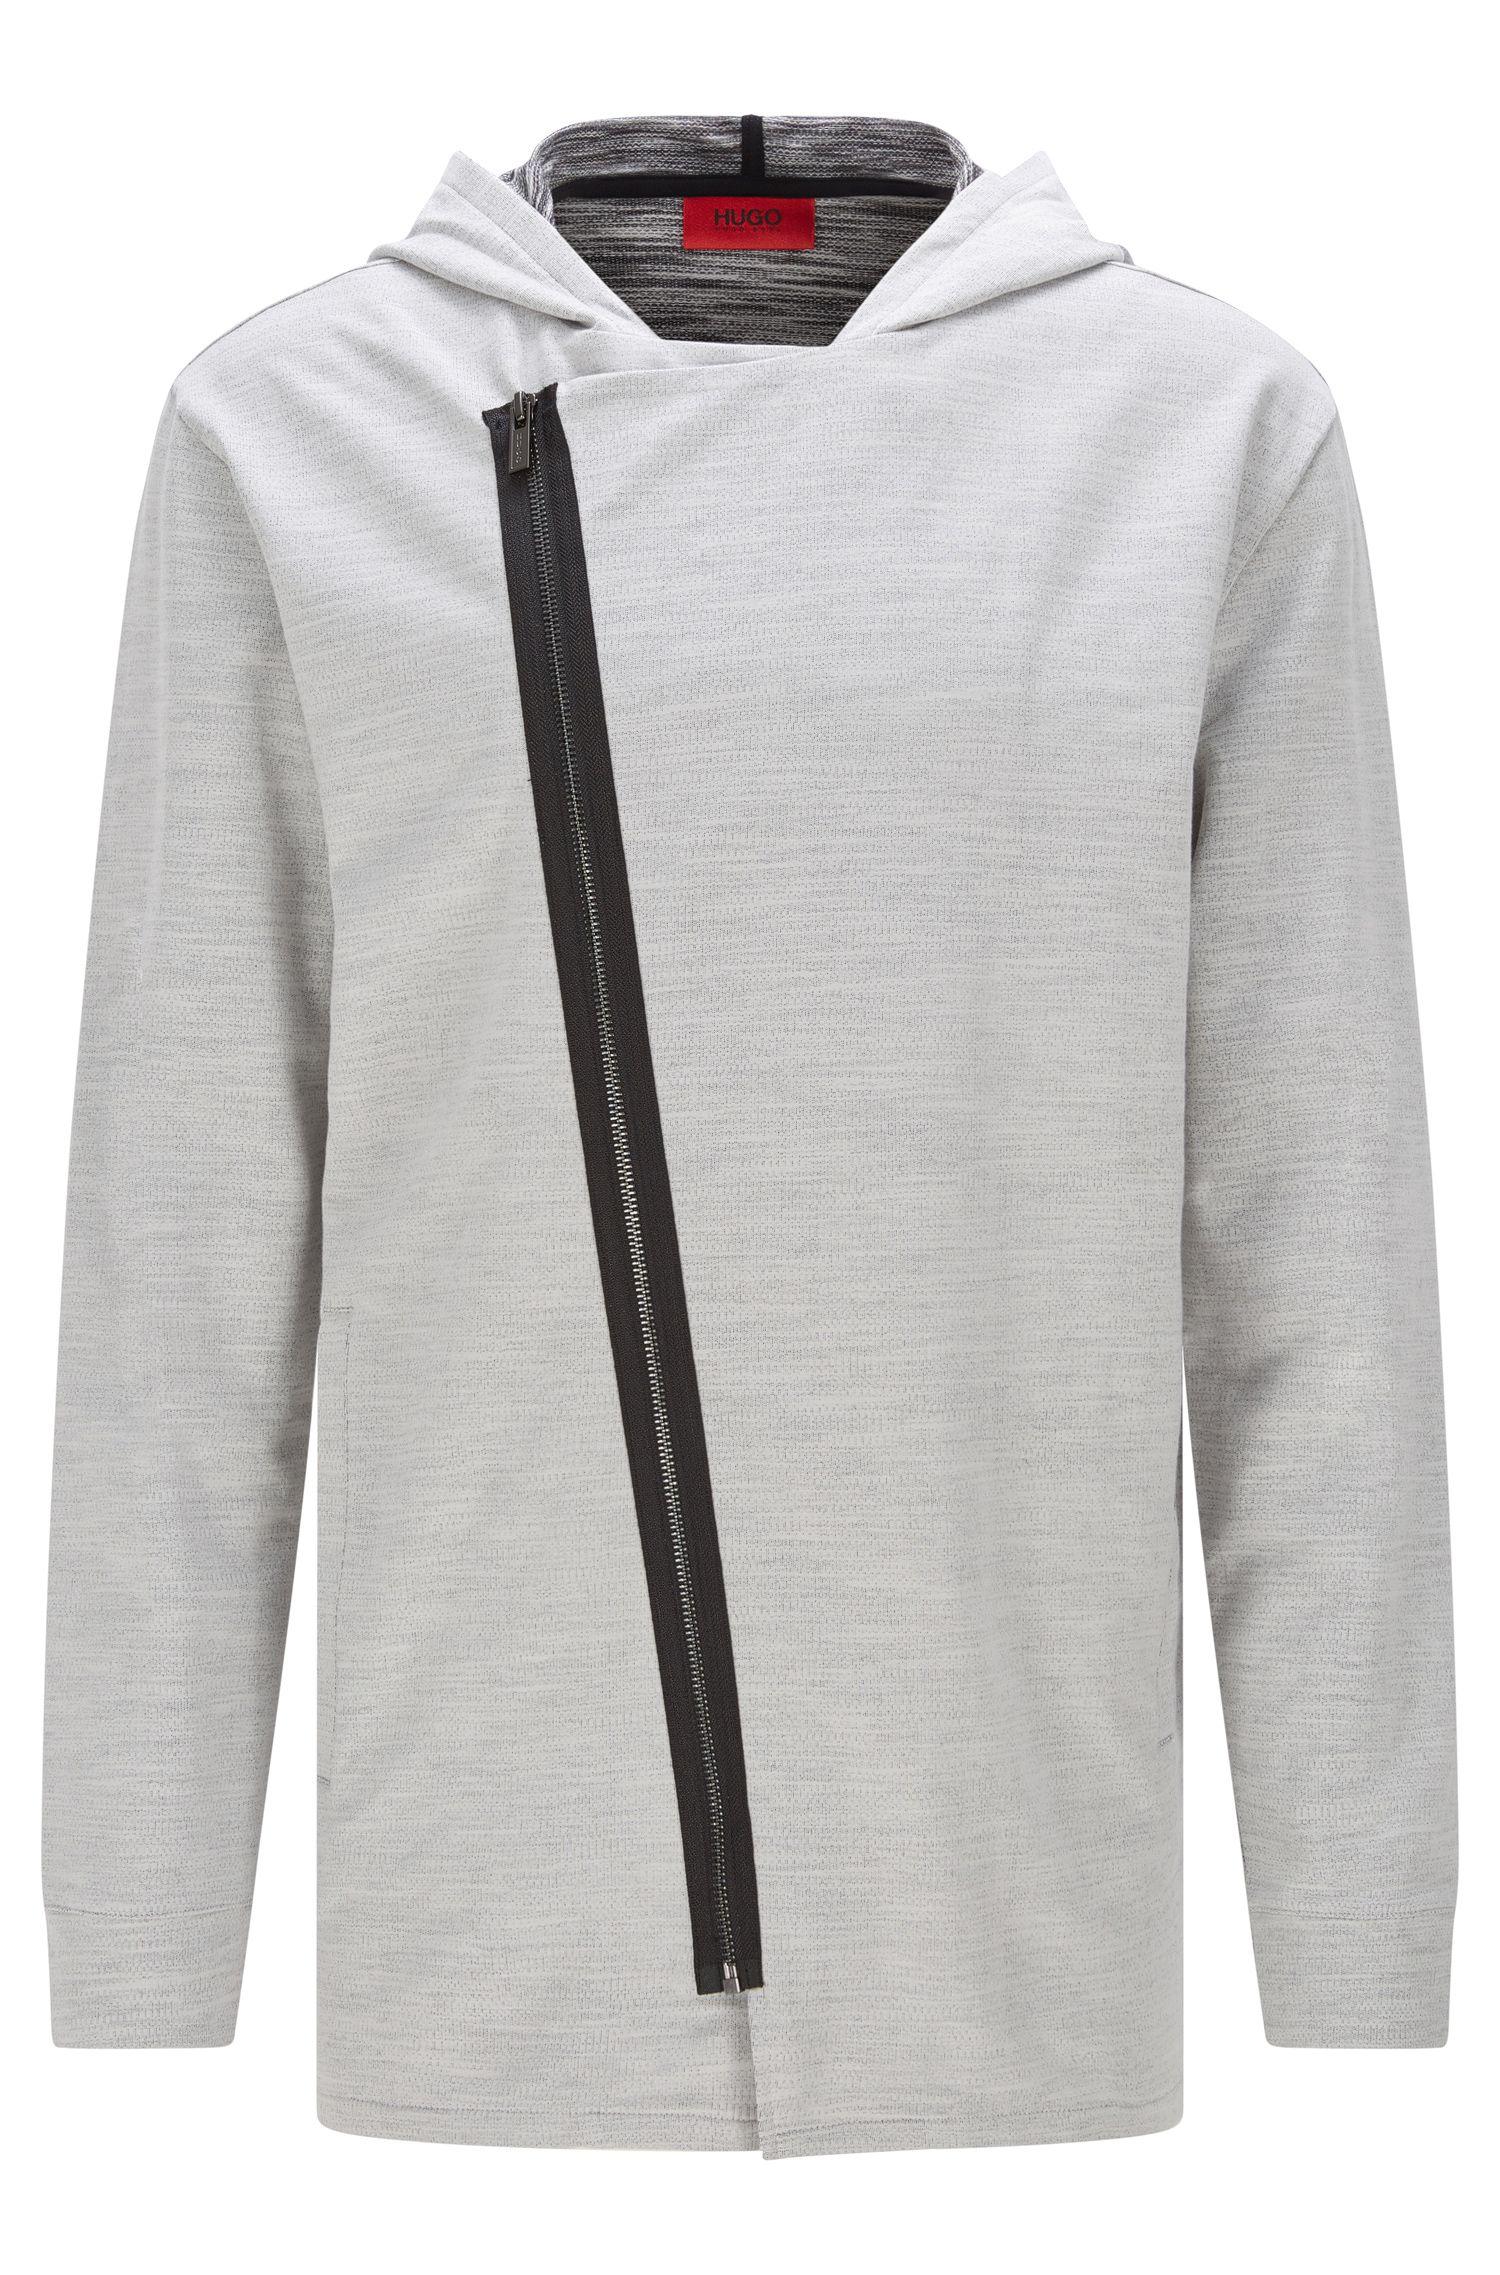 'Dells' | Stretch Cotton Zip Hooded Sweat Jacket